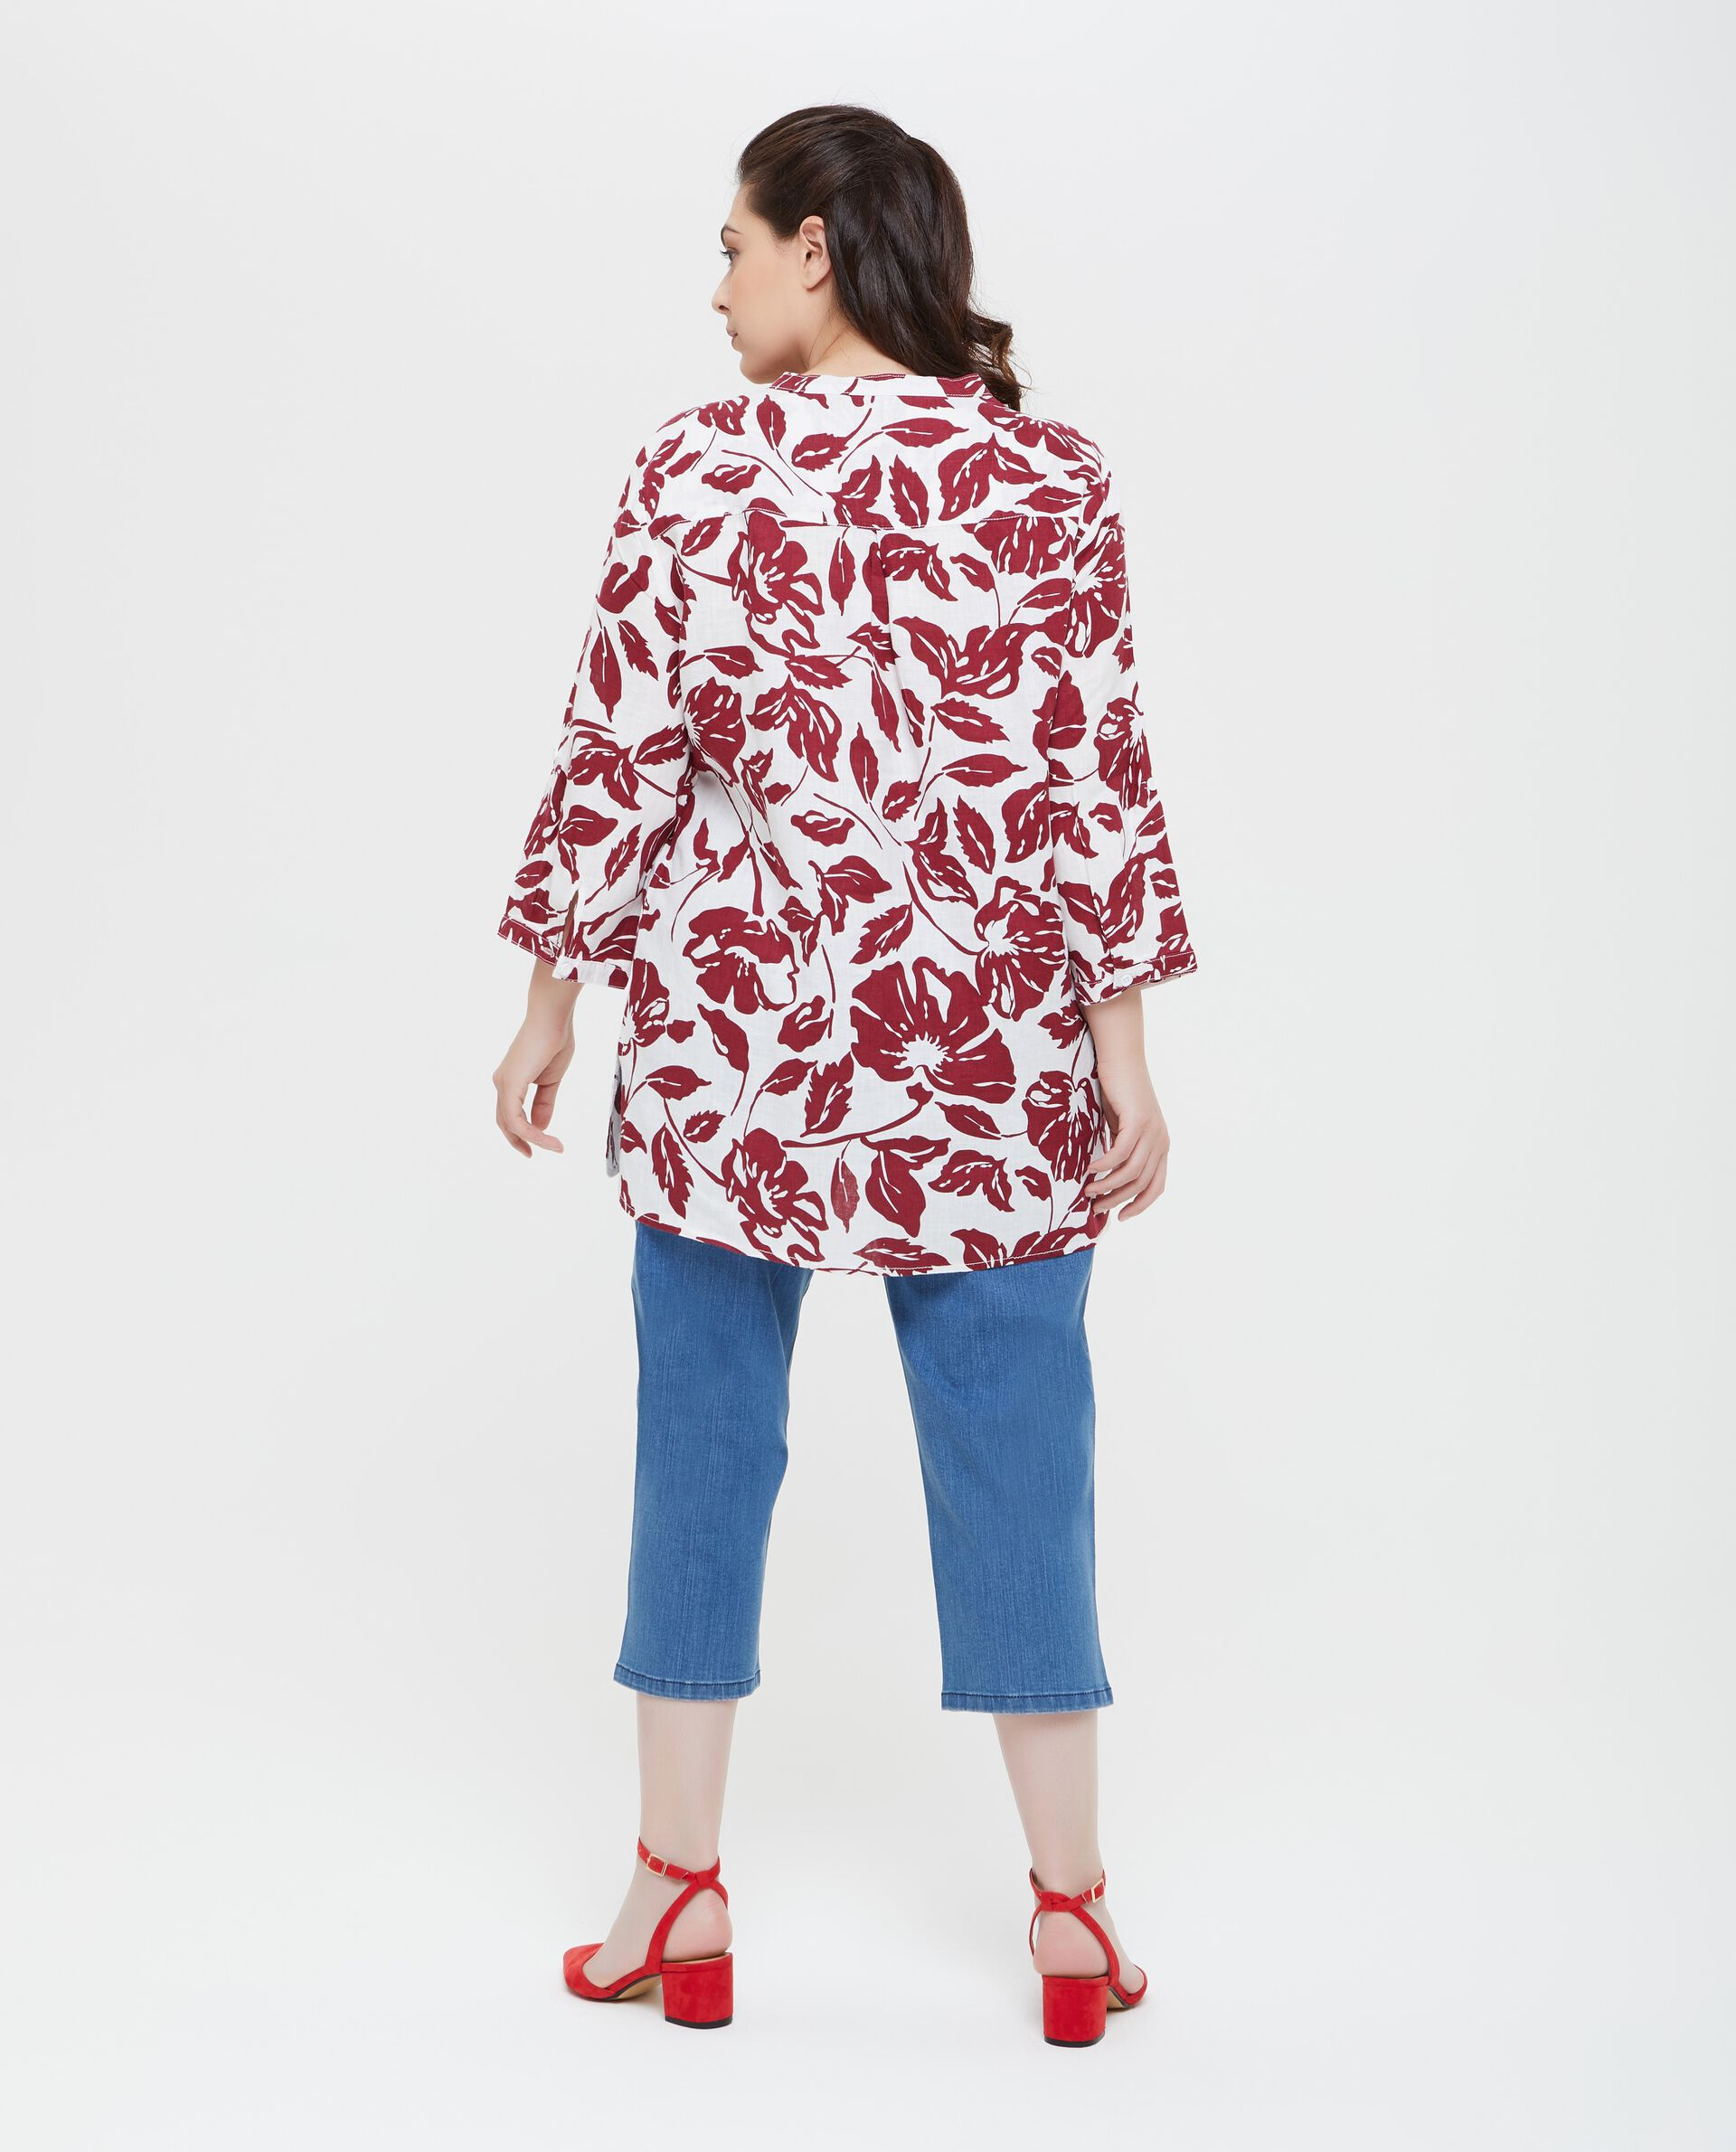 Blusa donna taglie comode in puro lino a fantasia floreale